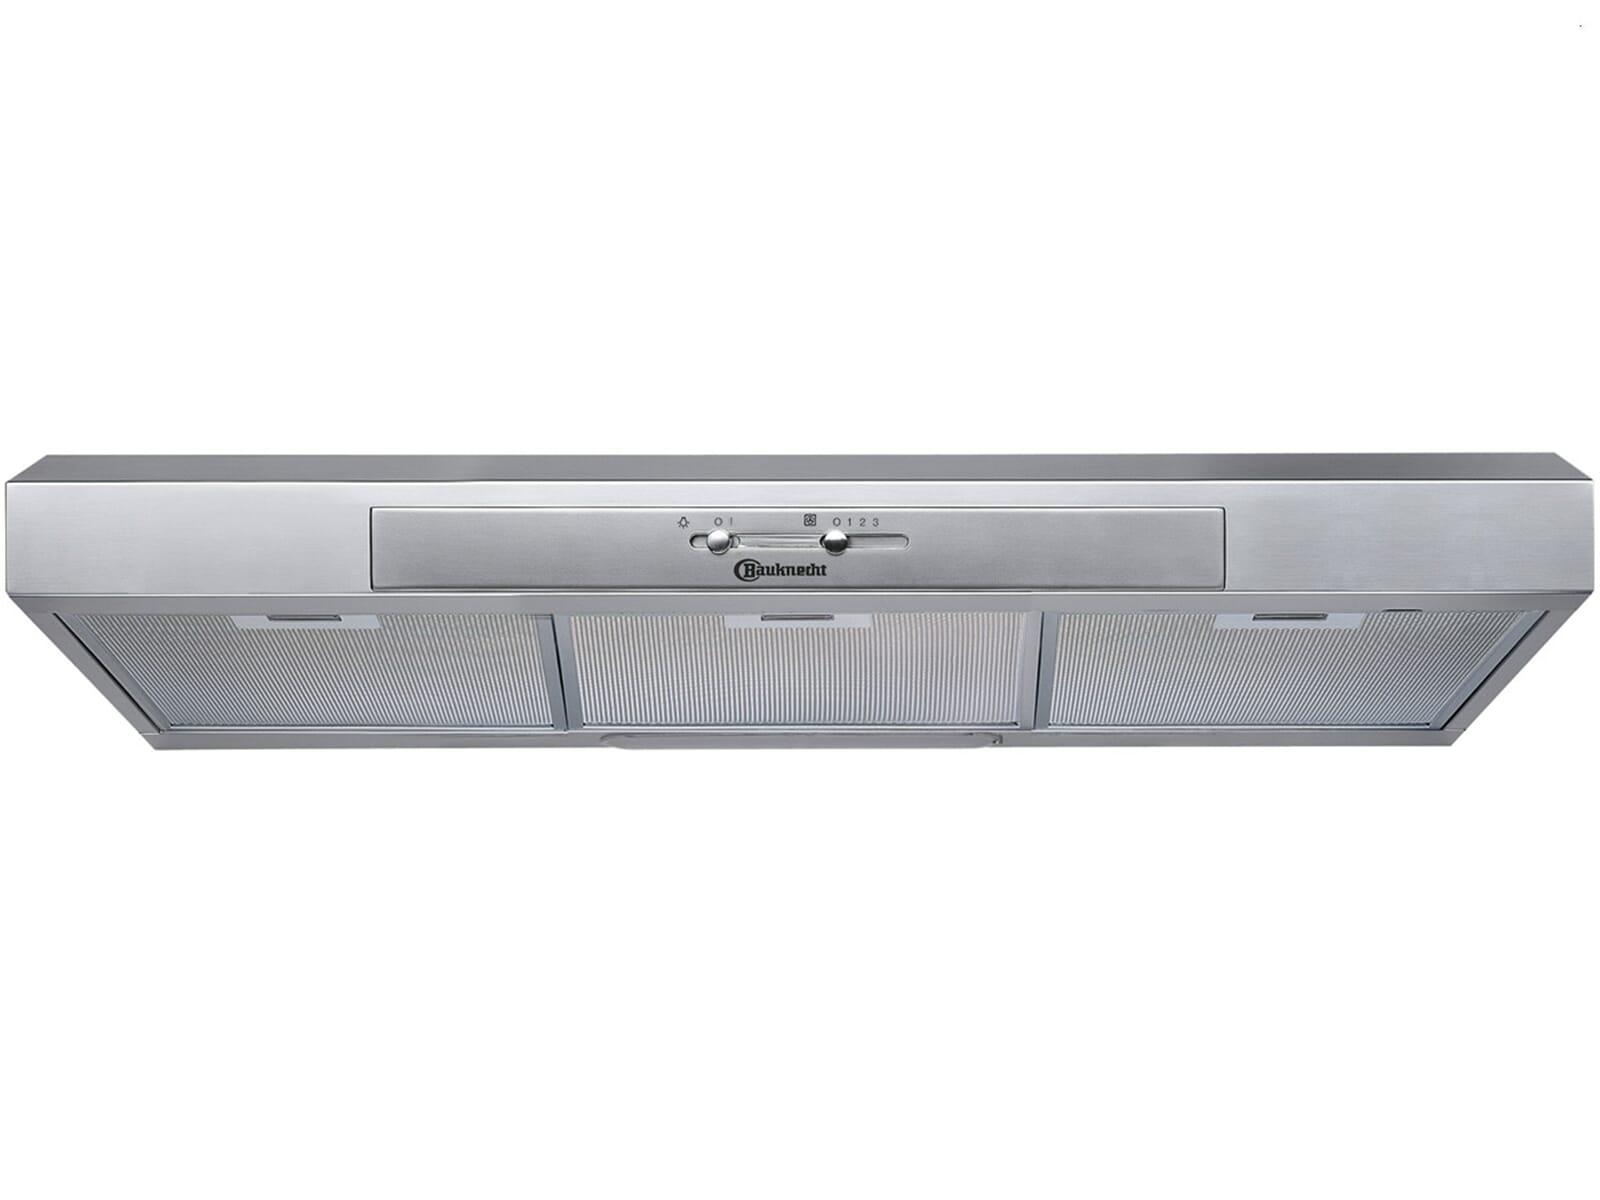 bauknecht dfh 5393 in unterbauhaube dunstabzugshaube edelstahl dunsthaube 90cm. Black Bedroom Furniture Sets. Home Design Ideas